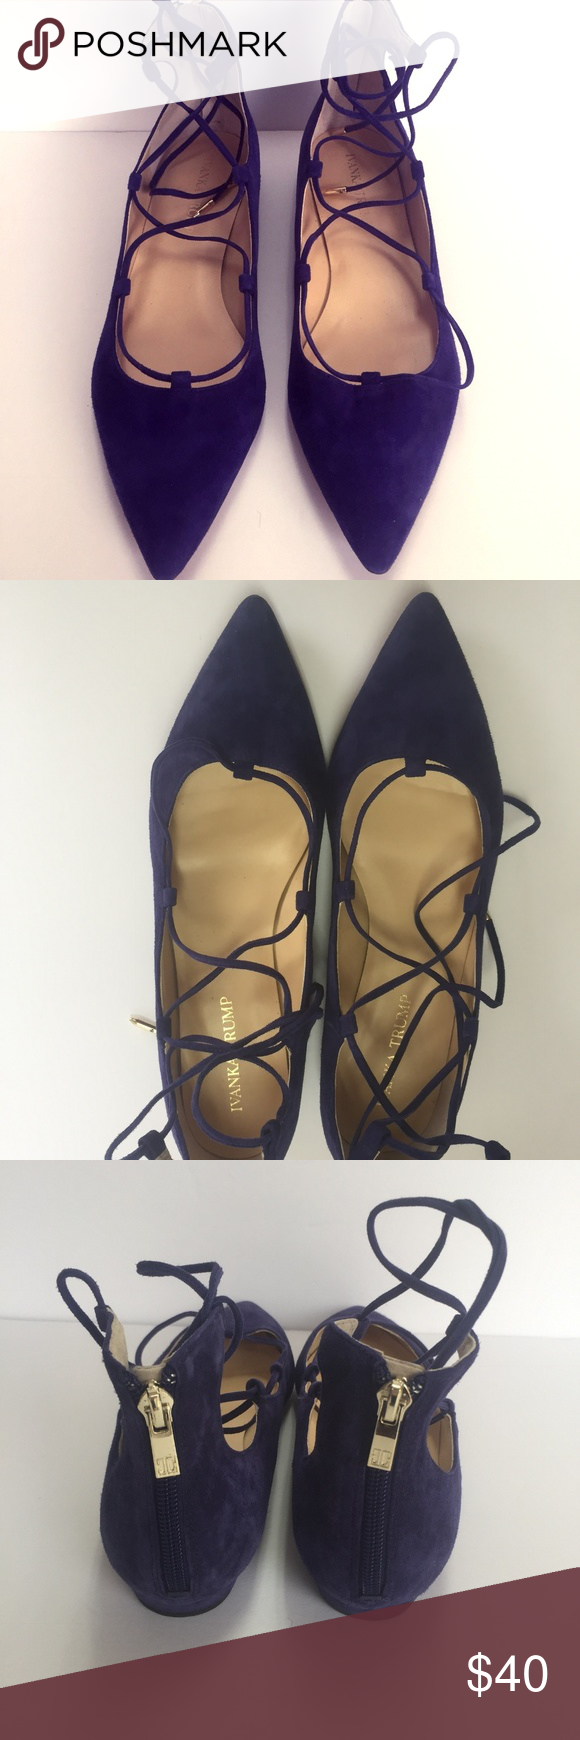 b0b86587114 Ivanka Trump Suede Blue Ballet Flats Pointed Toe Size US 9.5 Medium ...